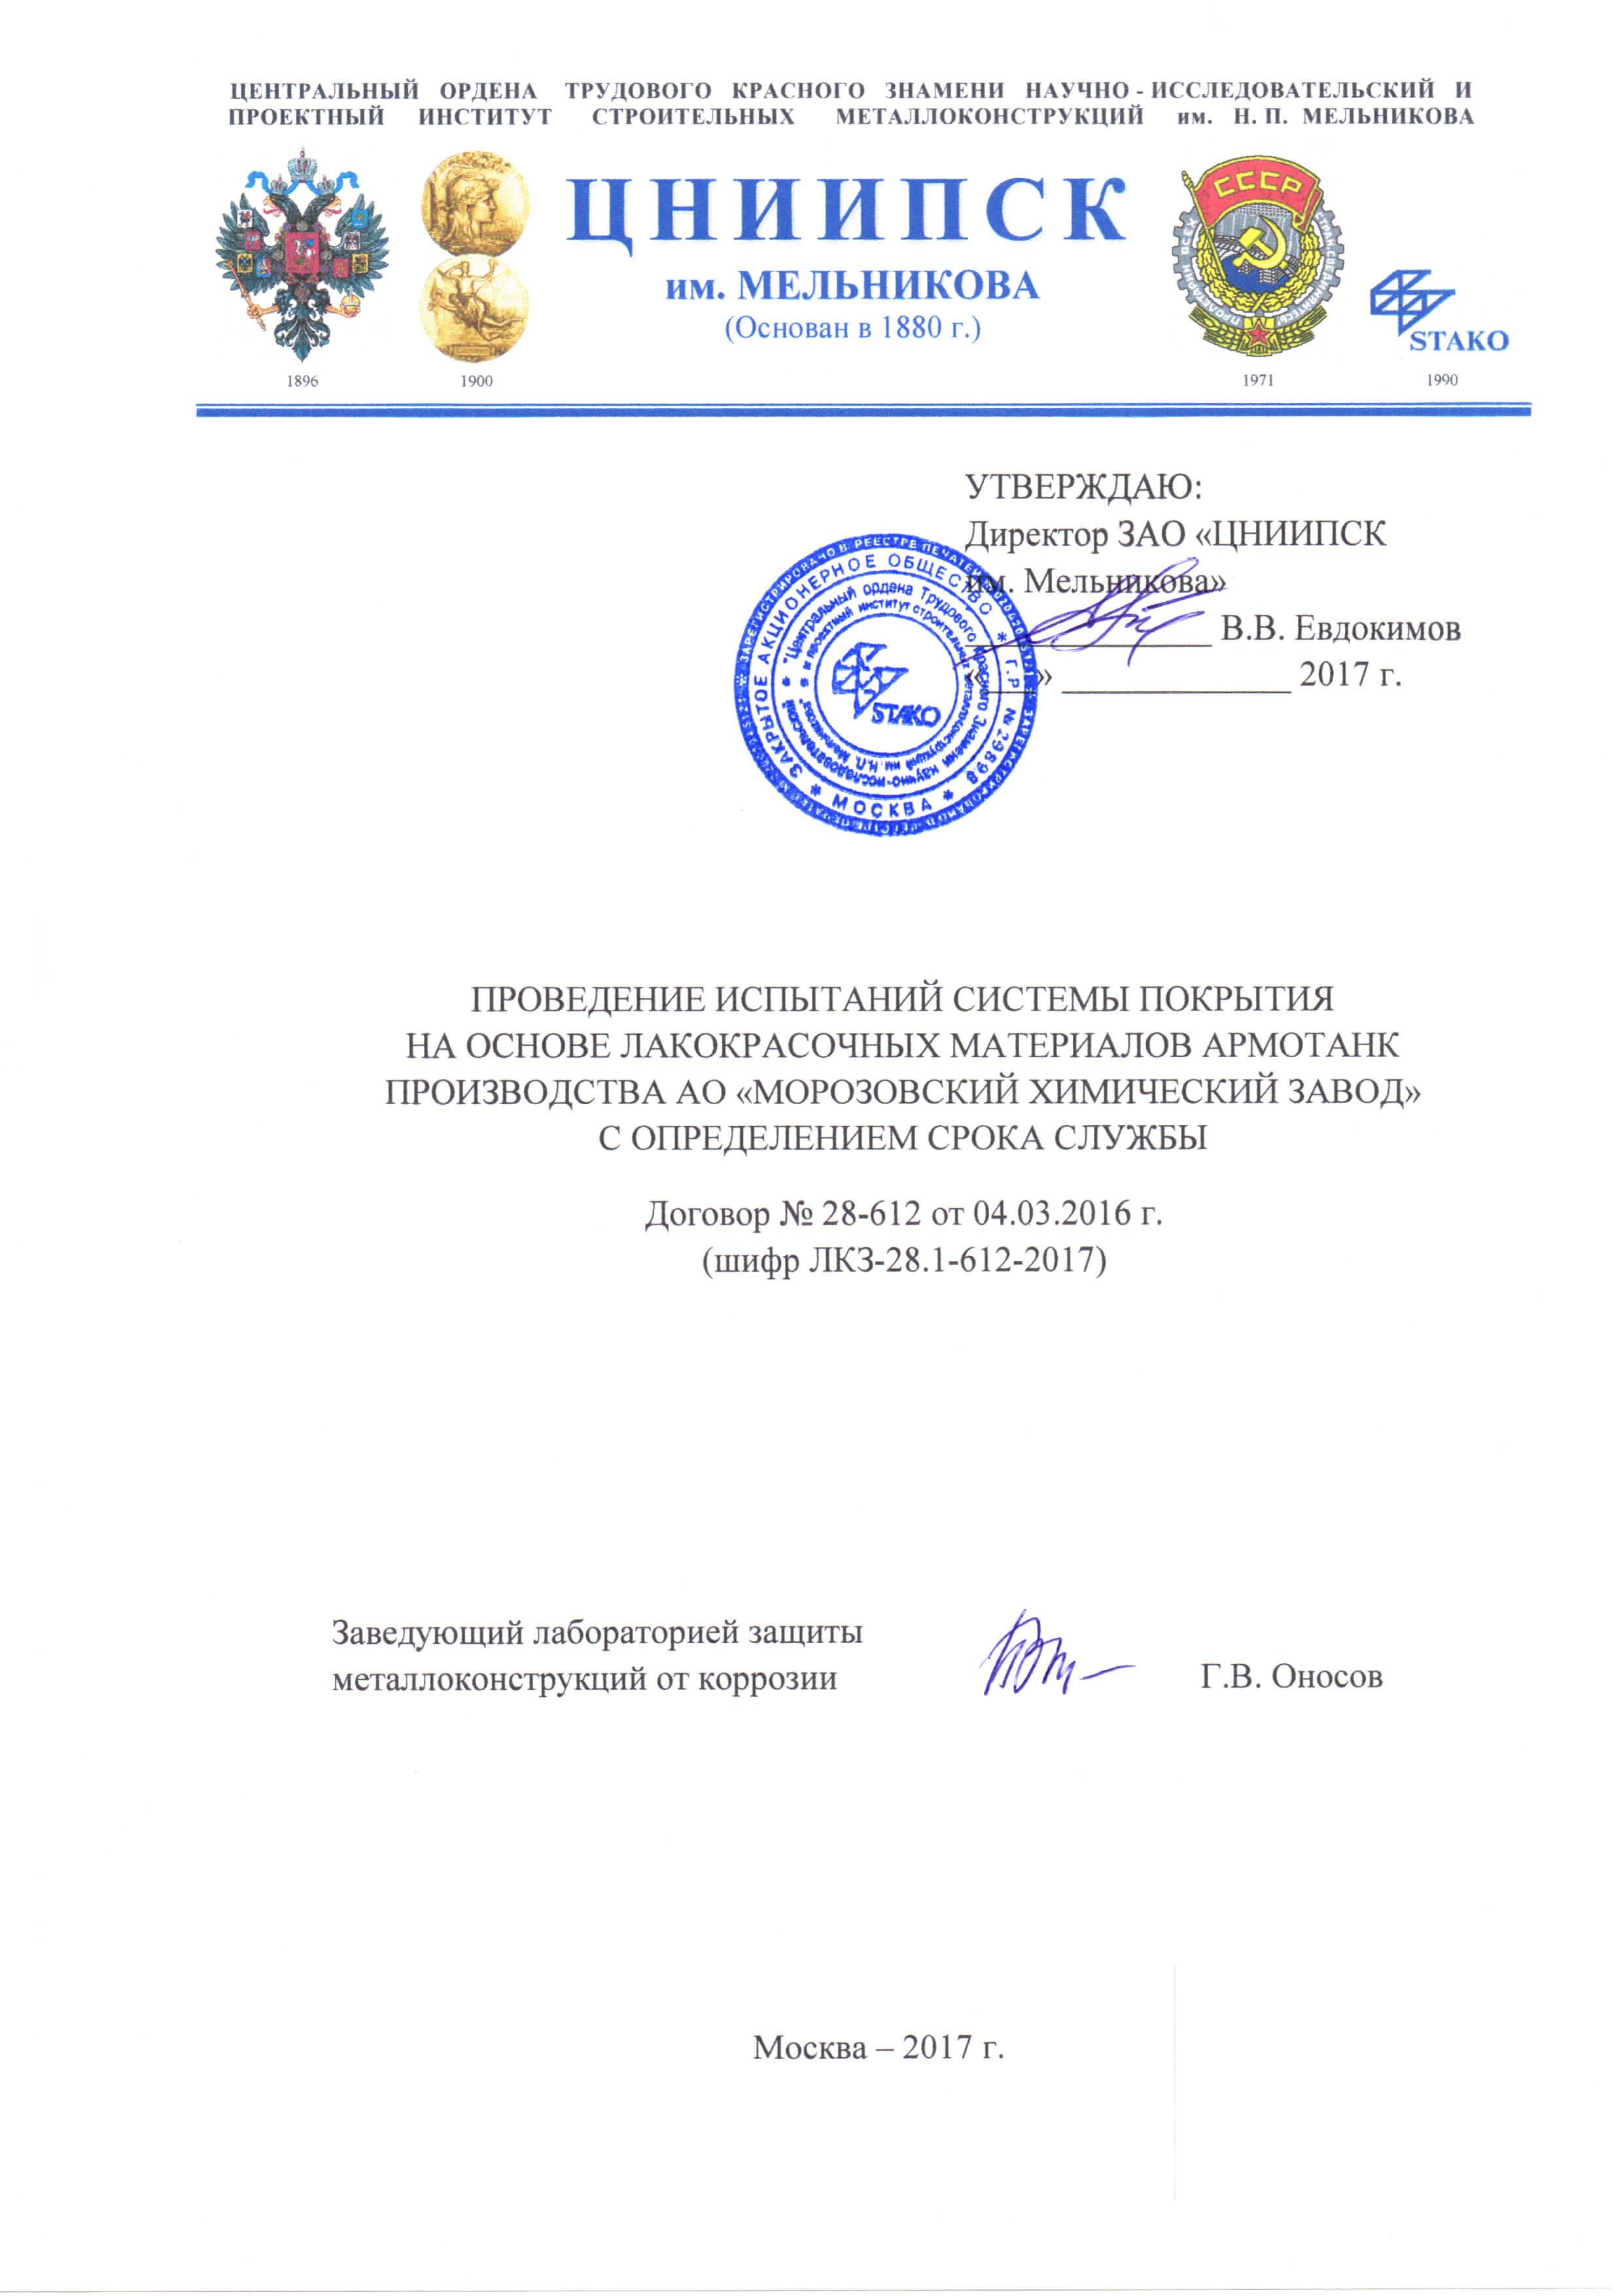 ЦНИИПСК им.Мельникова Армотанк 07+N700, 25 лет УХЛ1_Страница_01